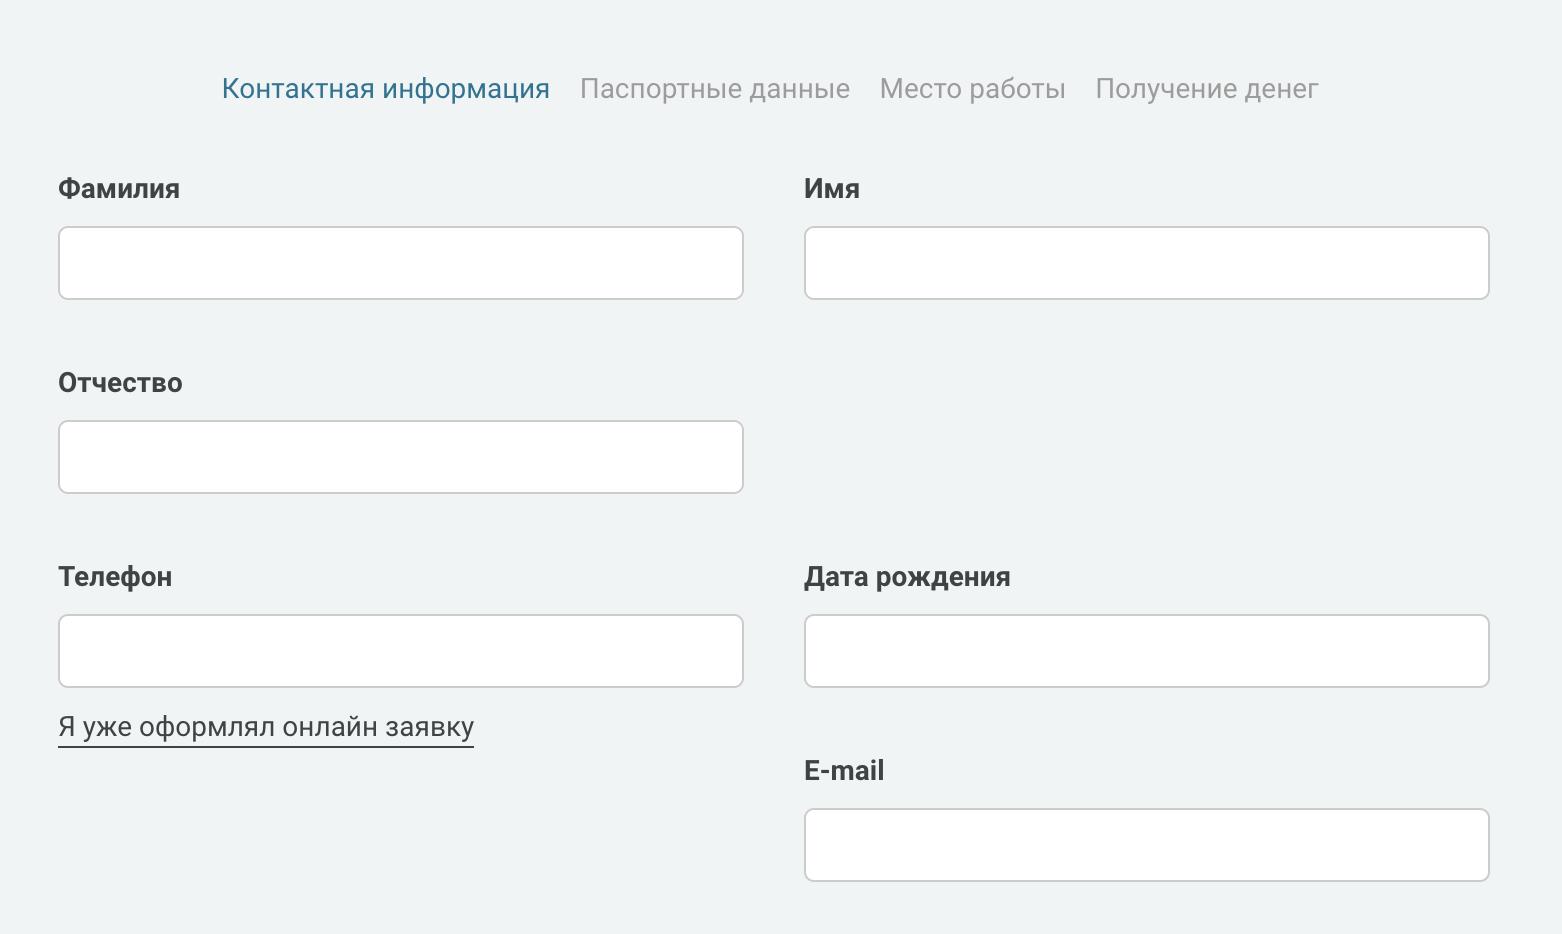 dazaim-register.png